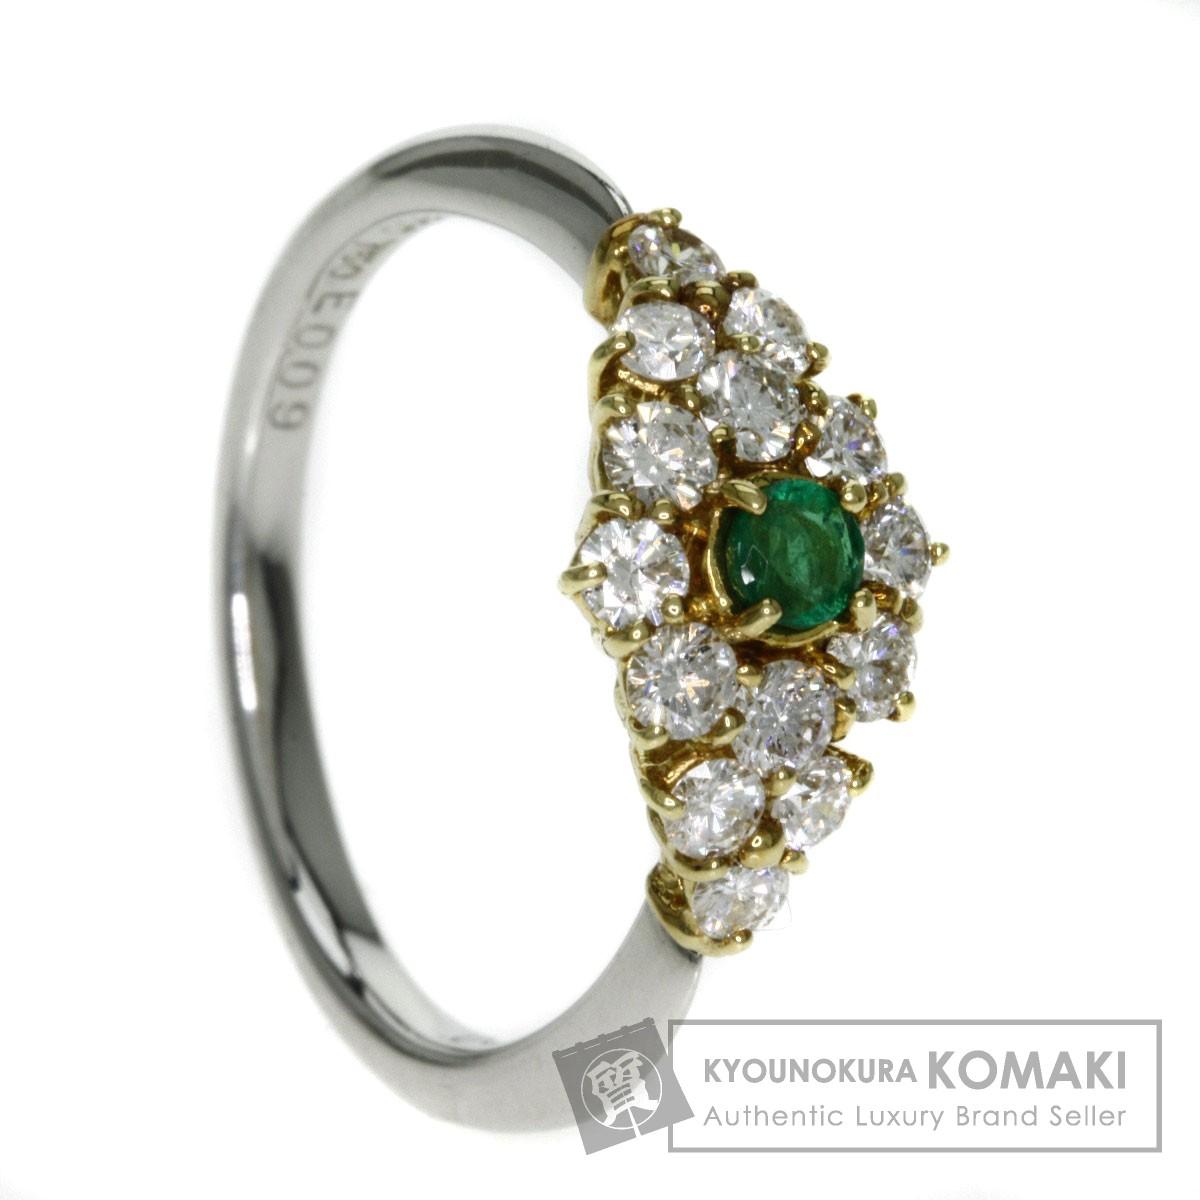 0.09ct エメラルド/ダイヤモンド リング・指輪 プラチナPT900/K18YG 3.4g レディース 【中古】